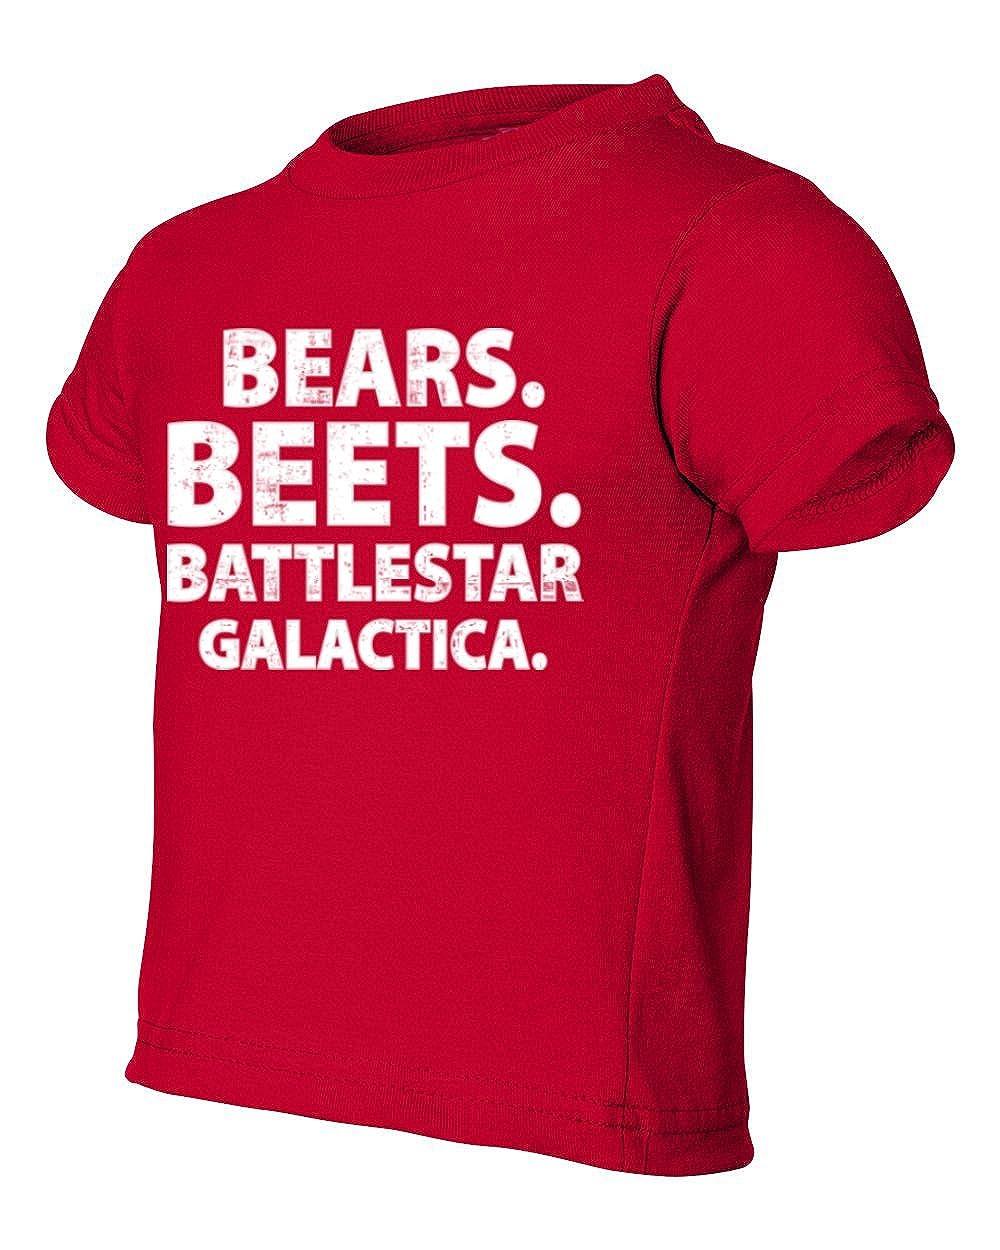 Societee The Office Kid Bears Beets Battlestar Galactica Toddler Little Boy Infant T-Shirt